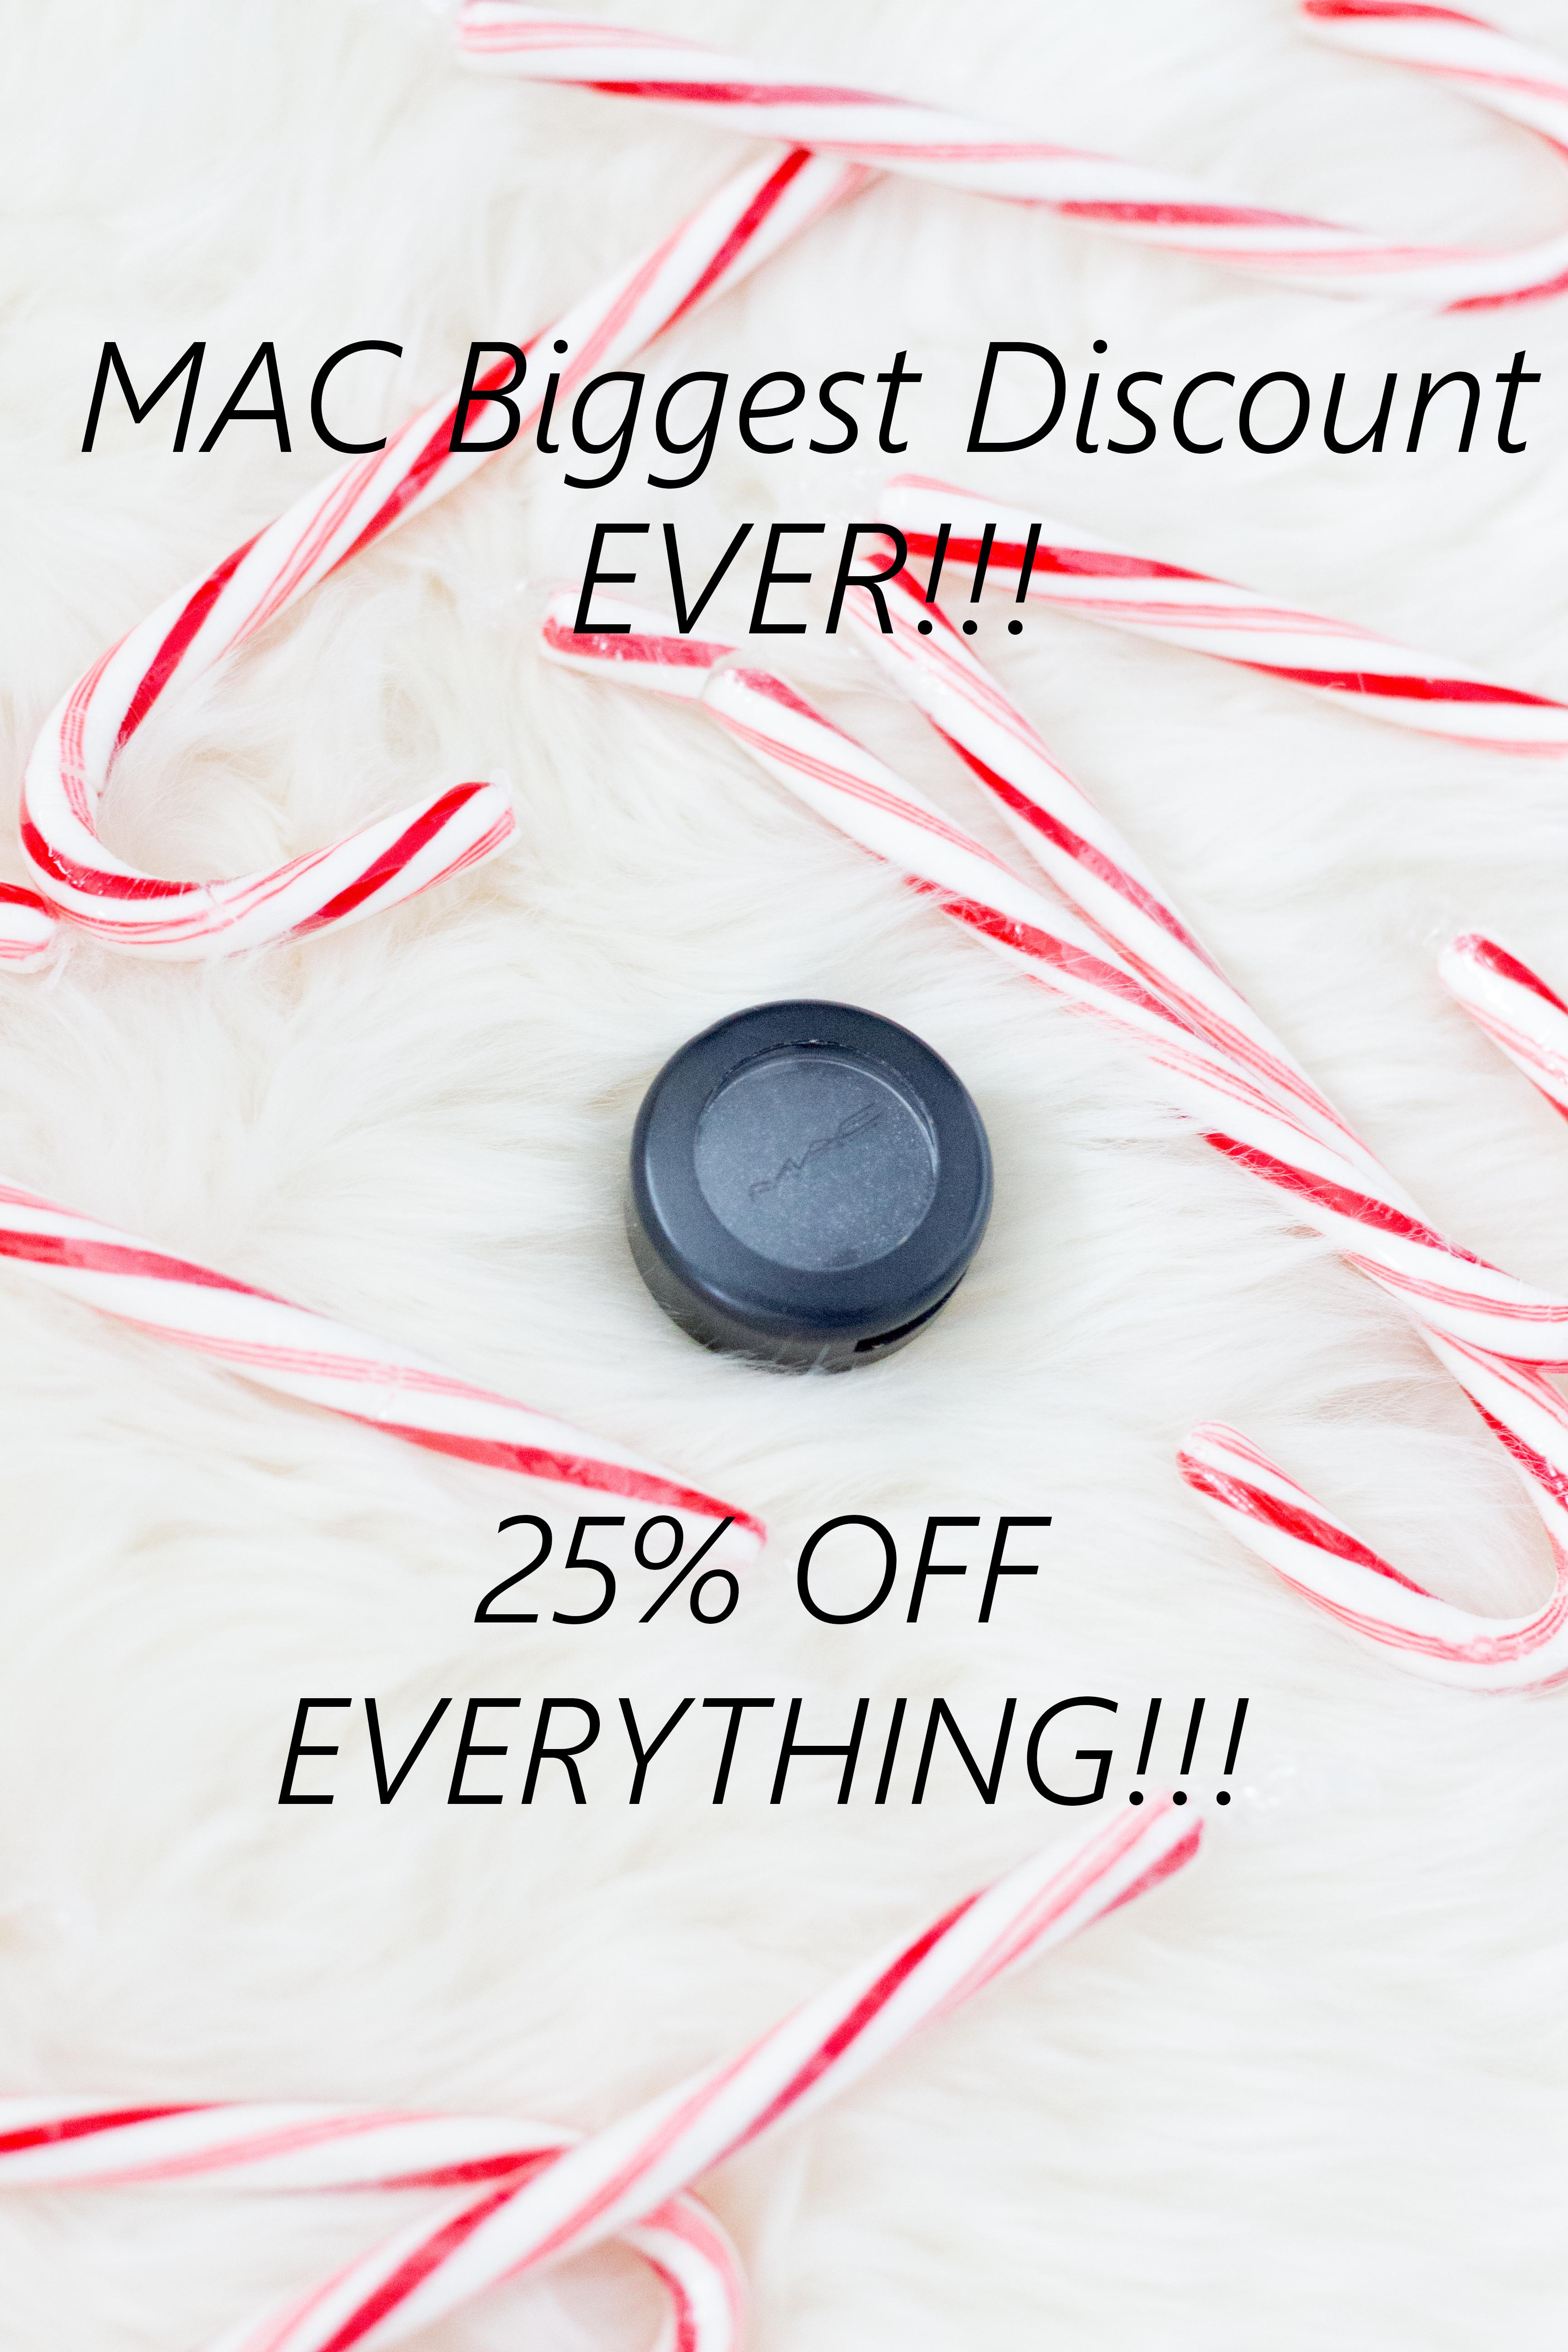 MAC Biggest Discount EVER!!!